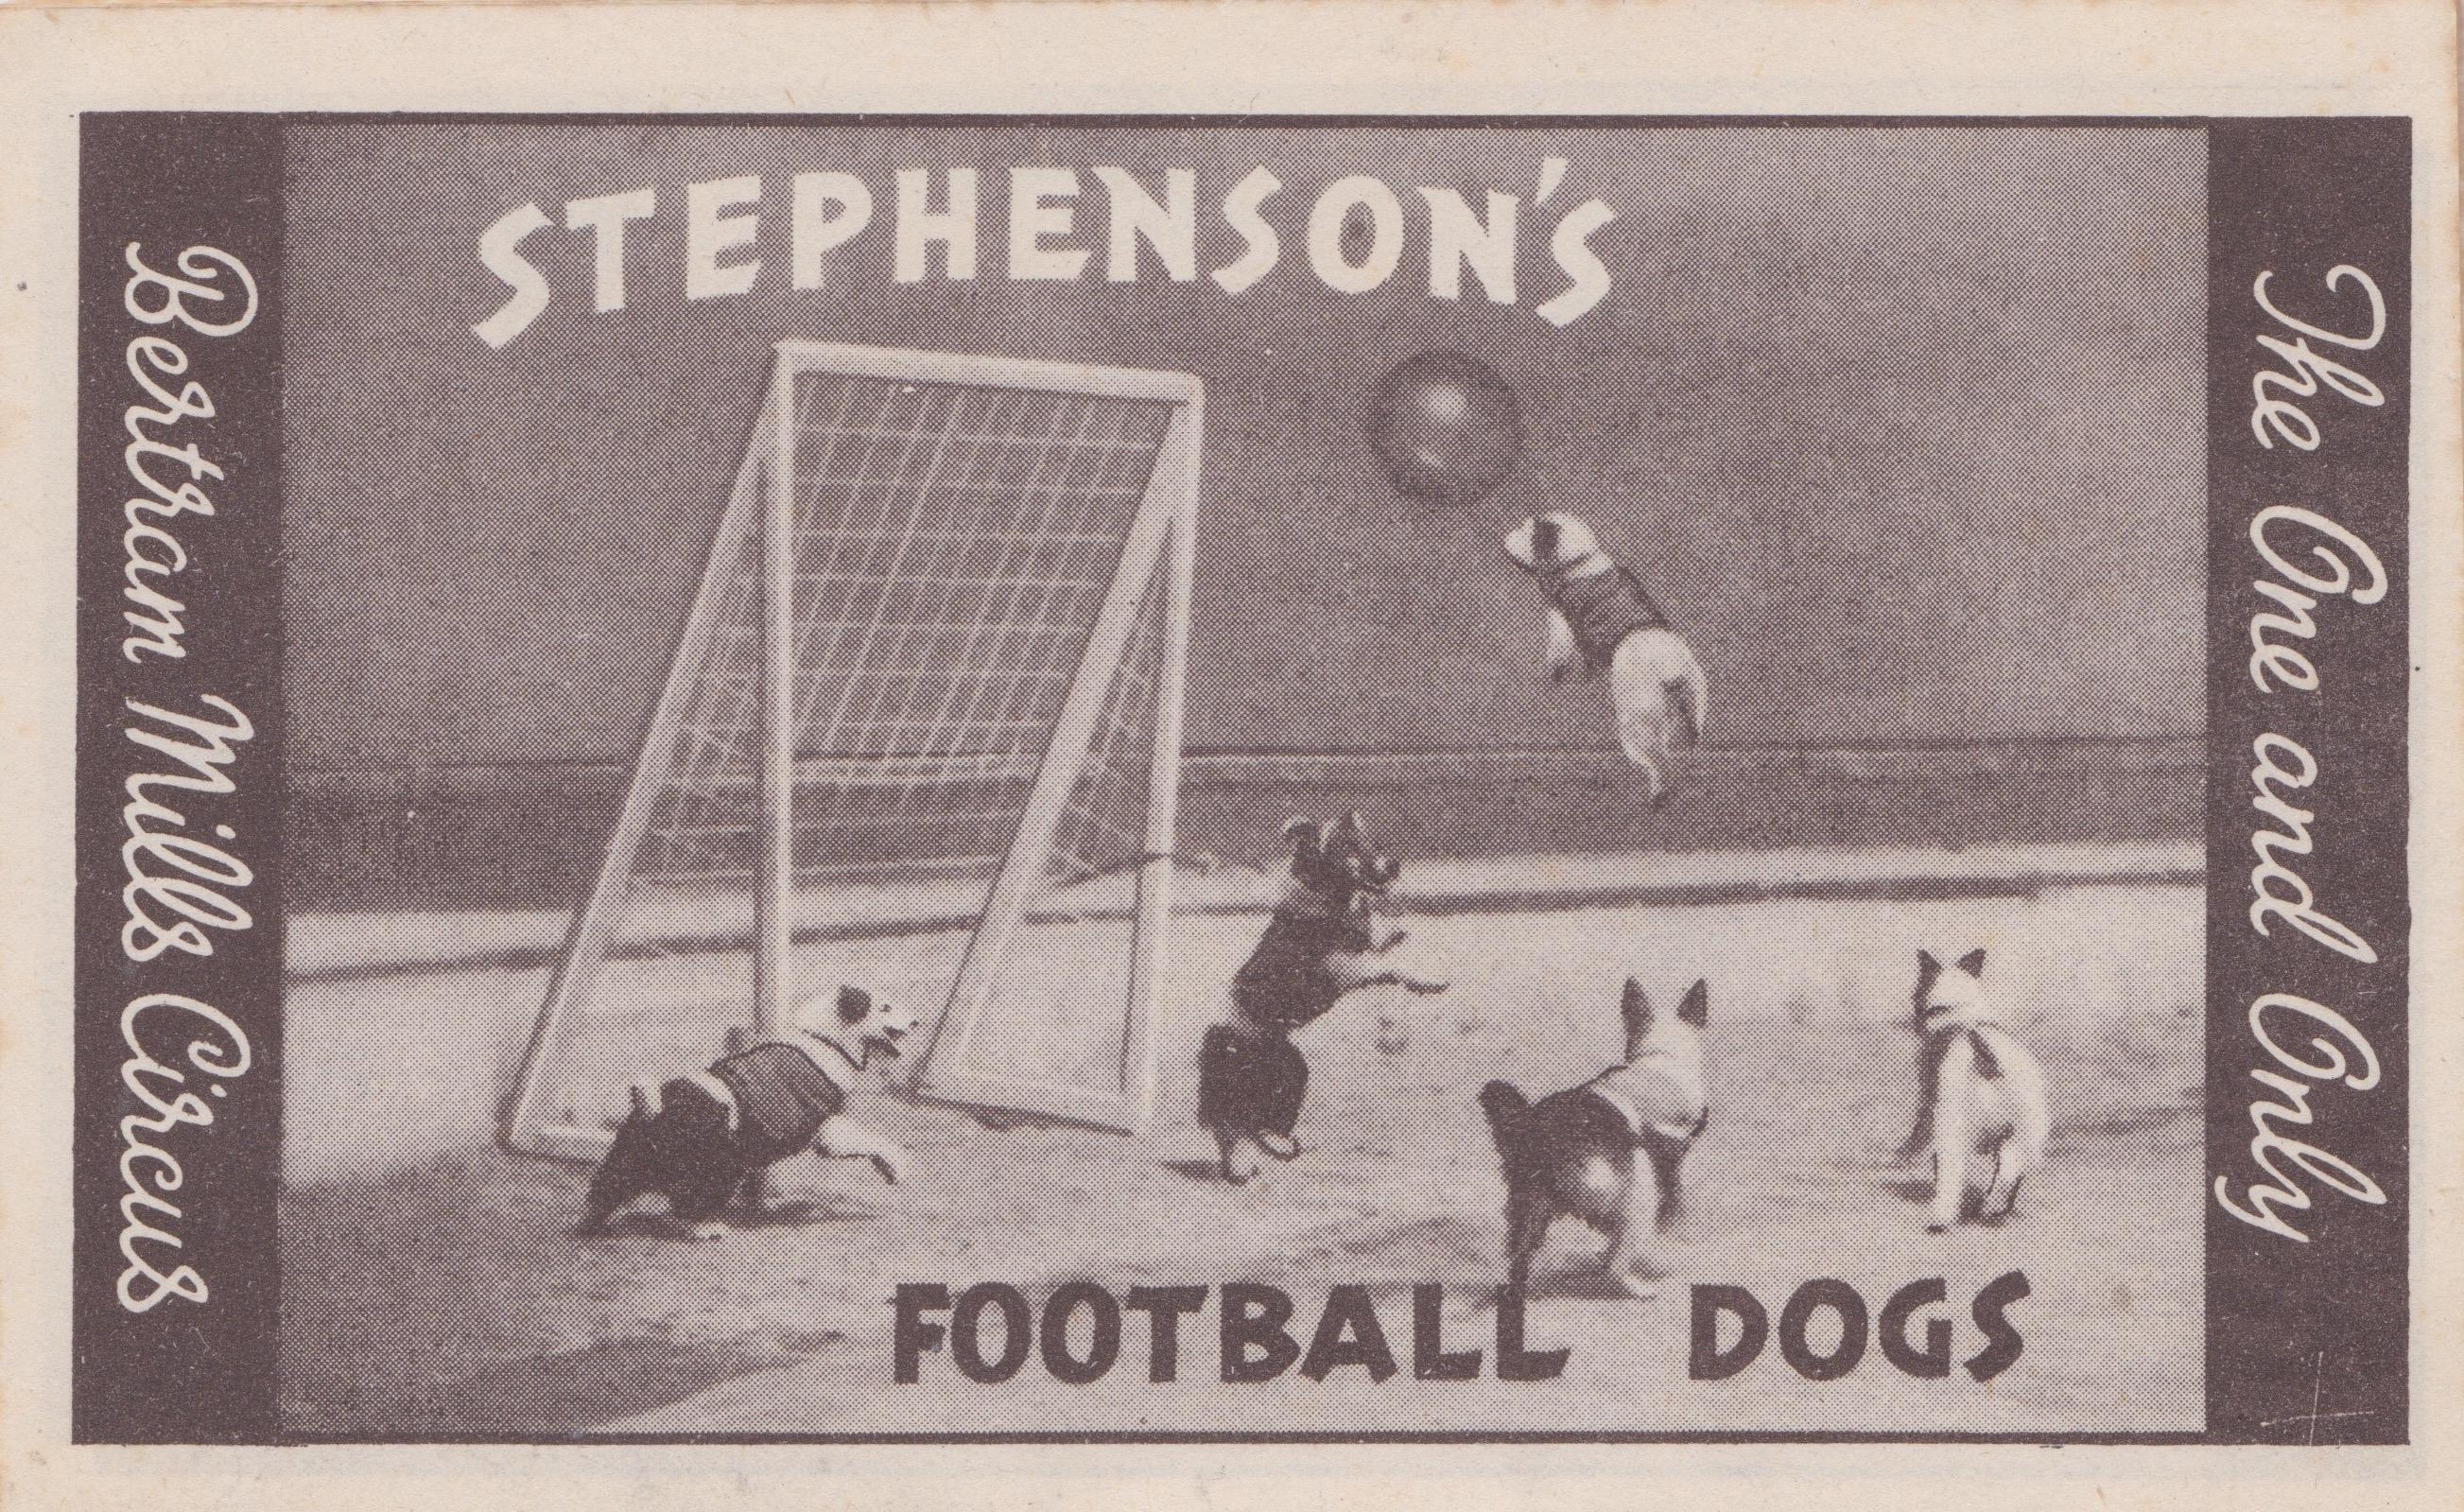 Bertram Mills Circus Dec 17 1948Stephenson's Football Dogs